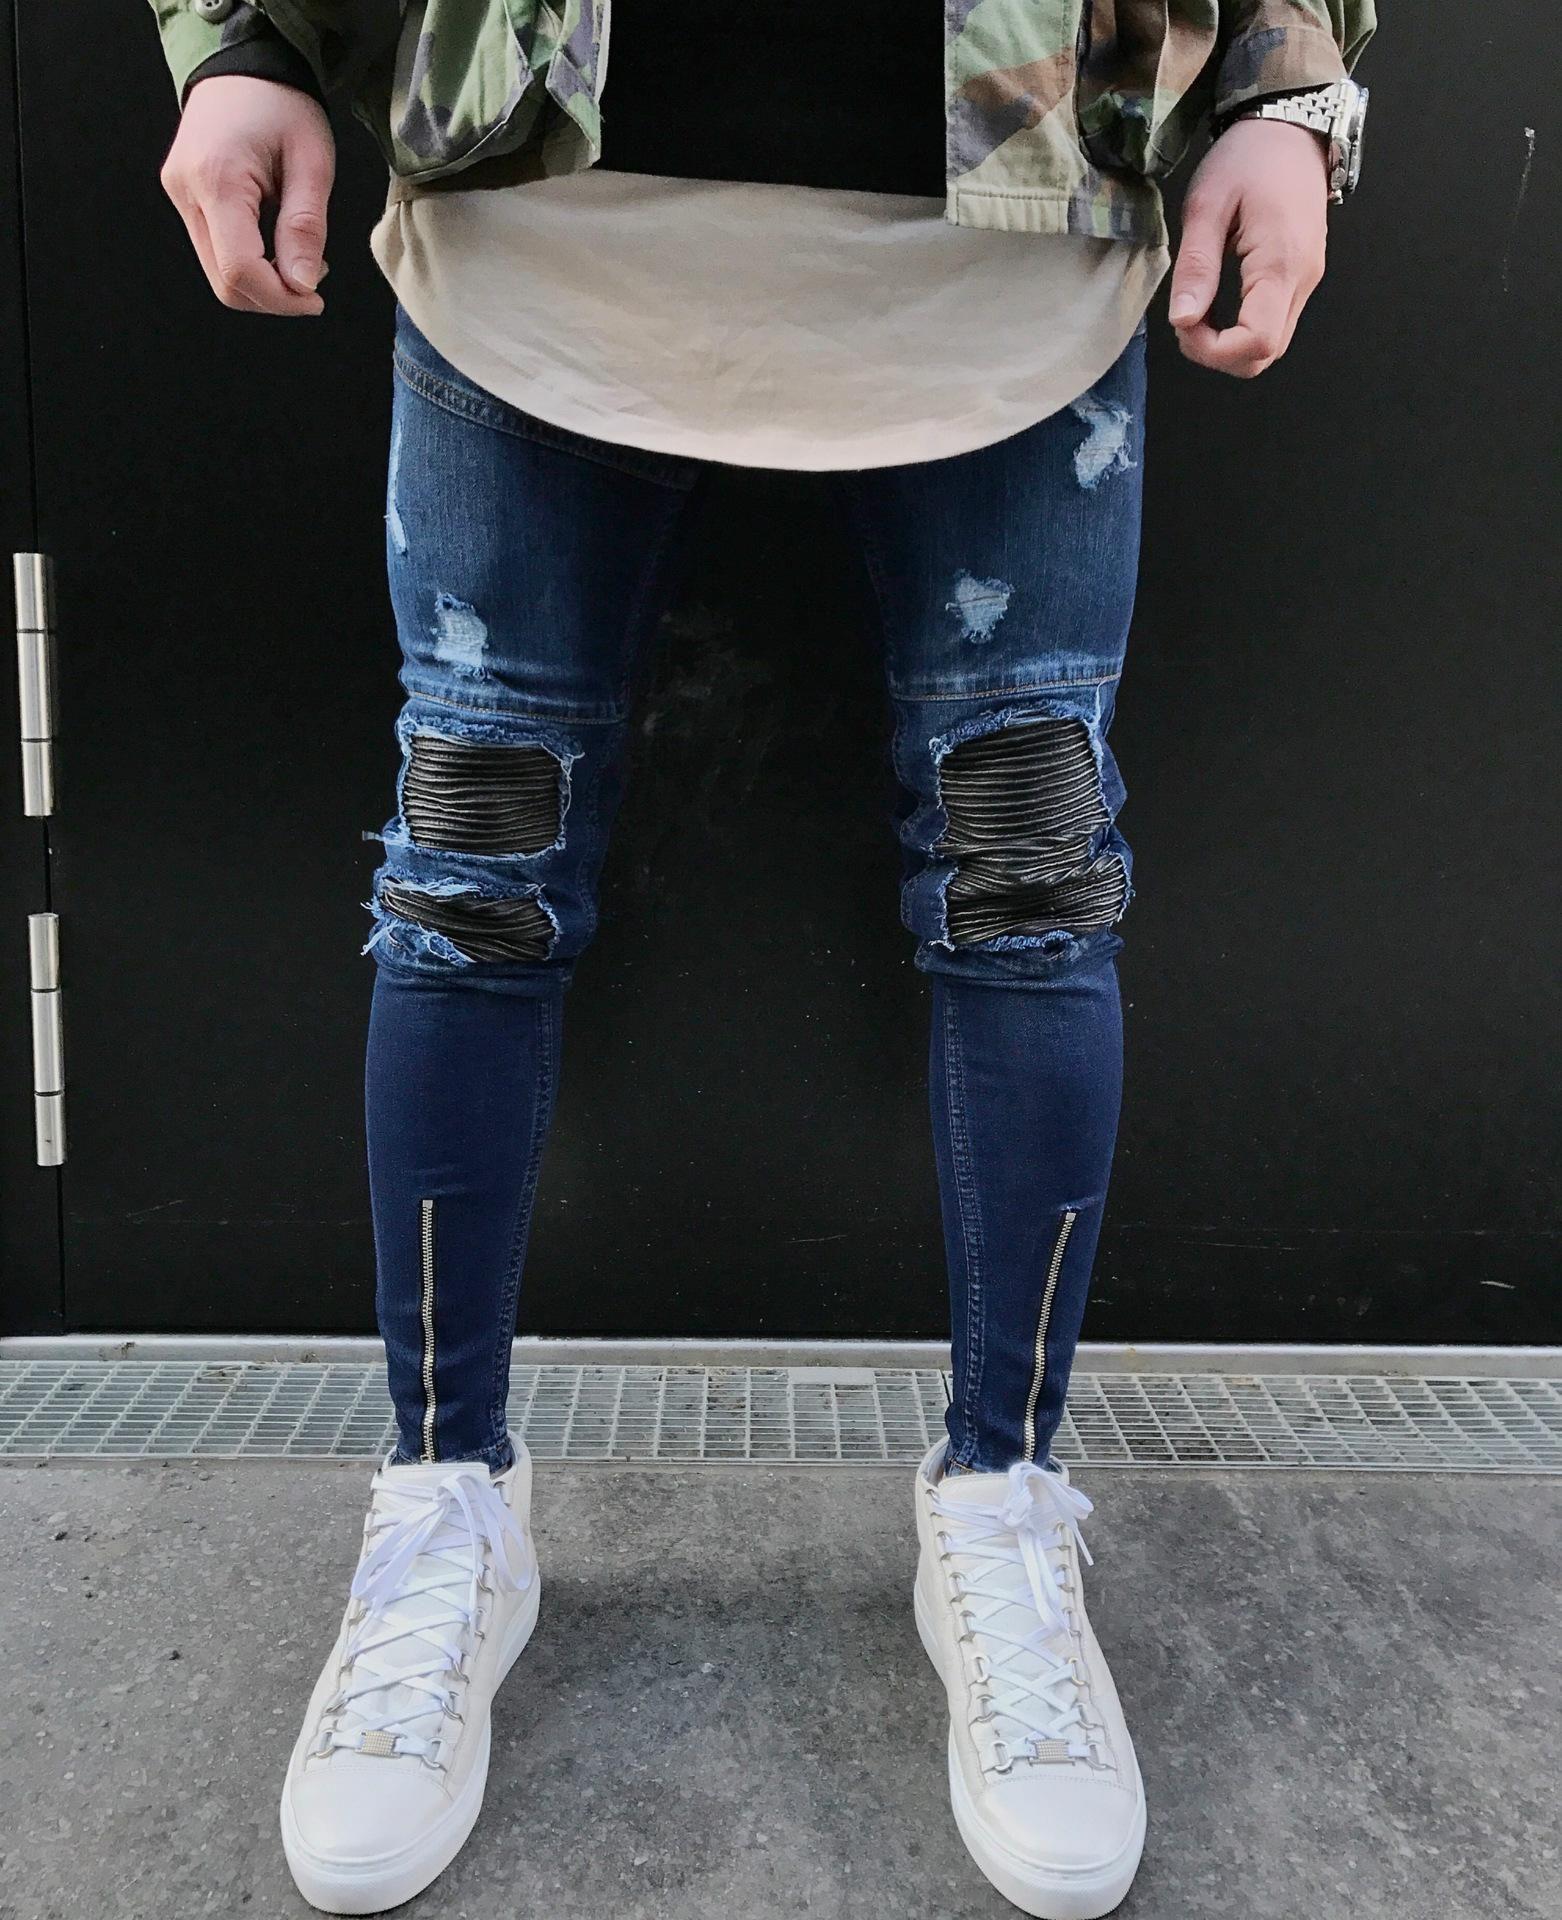 Pantalones Elasticos Para Motocicleta Con Agujeros Para Hombre Pantalones Ajustados De Mezclilla Azul Moda Hombre Ropa Casual Hombres Jeans De Moda